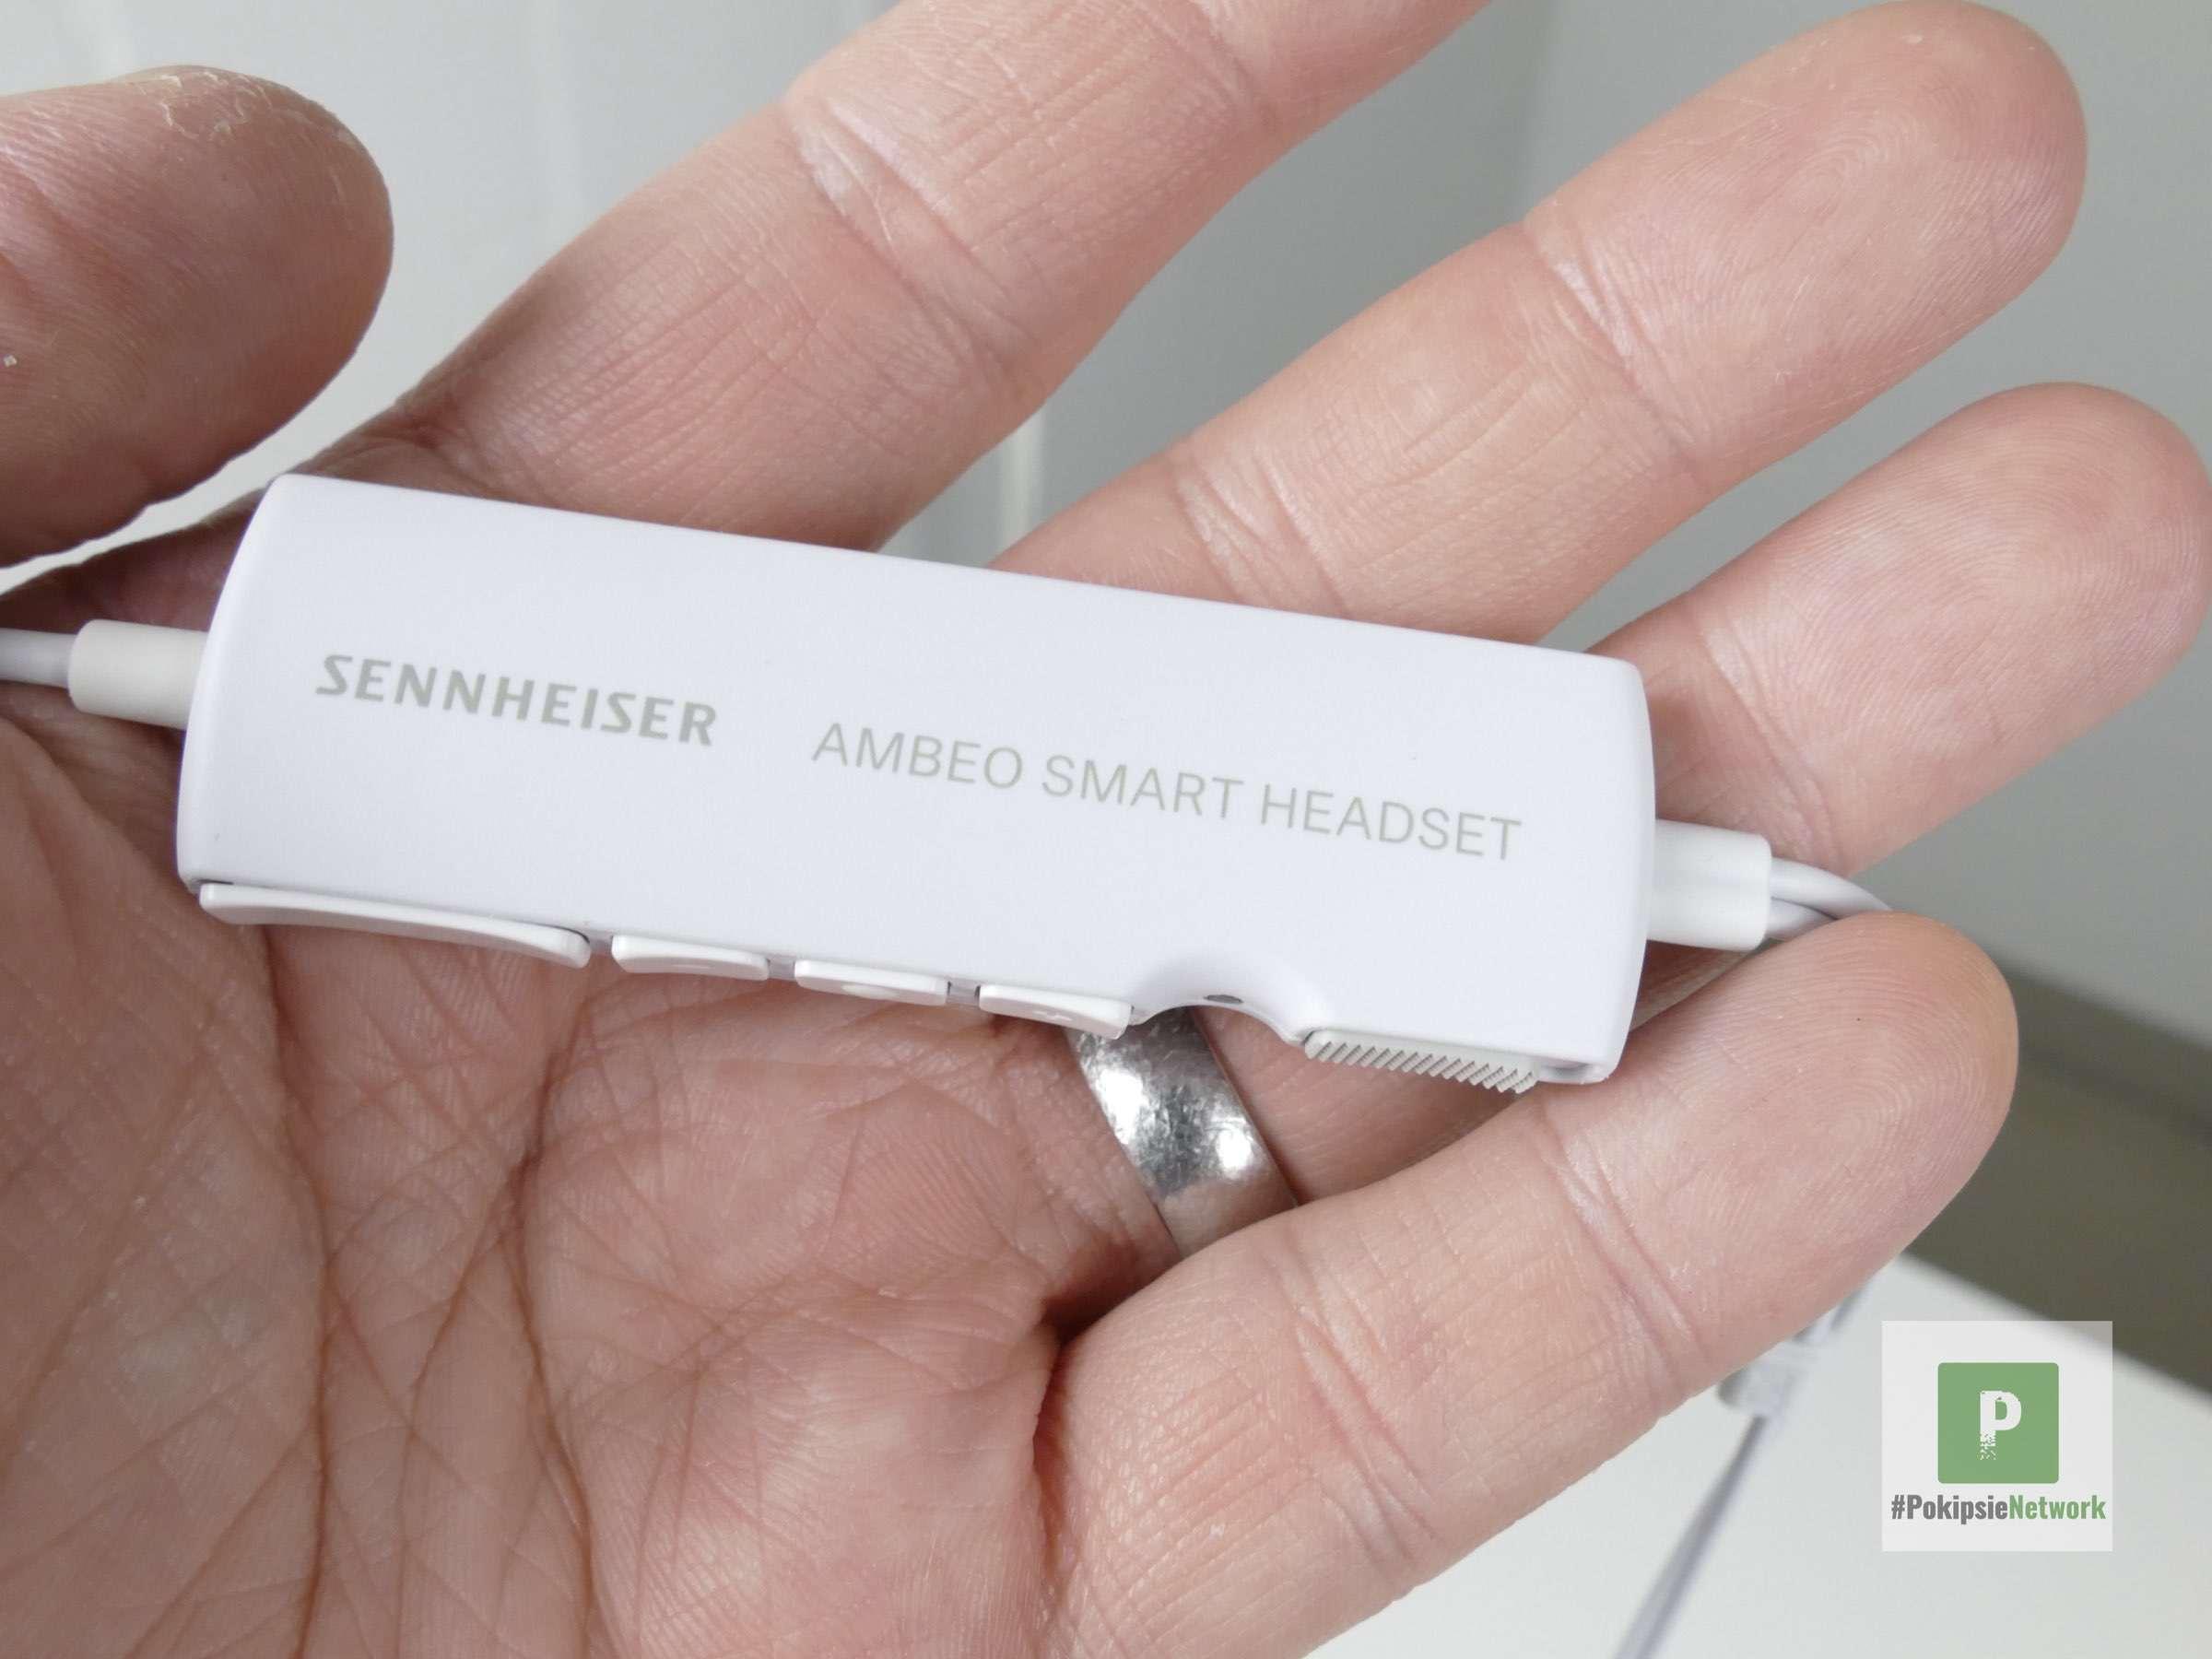 Sennheiser Ambeo Smart Headset Testbericht